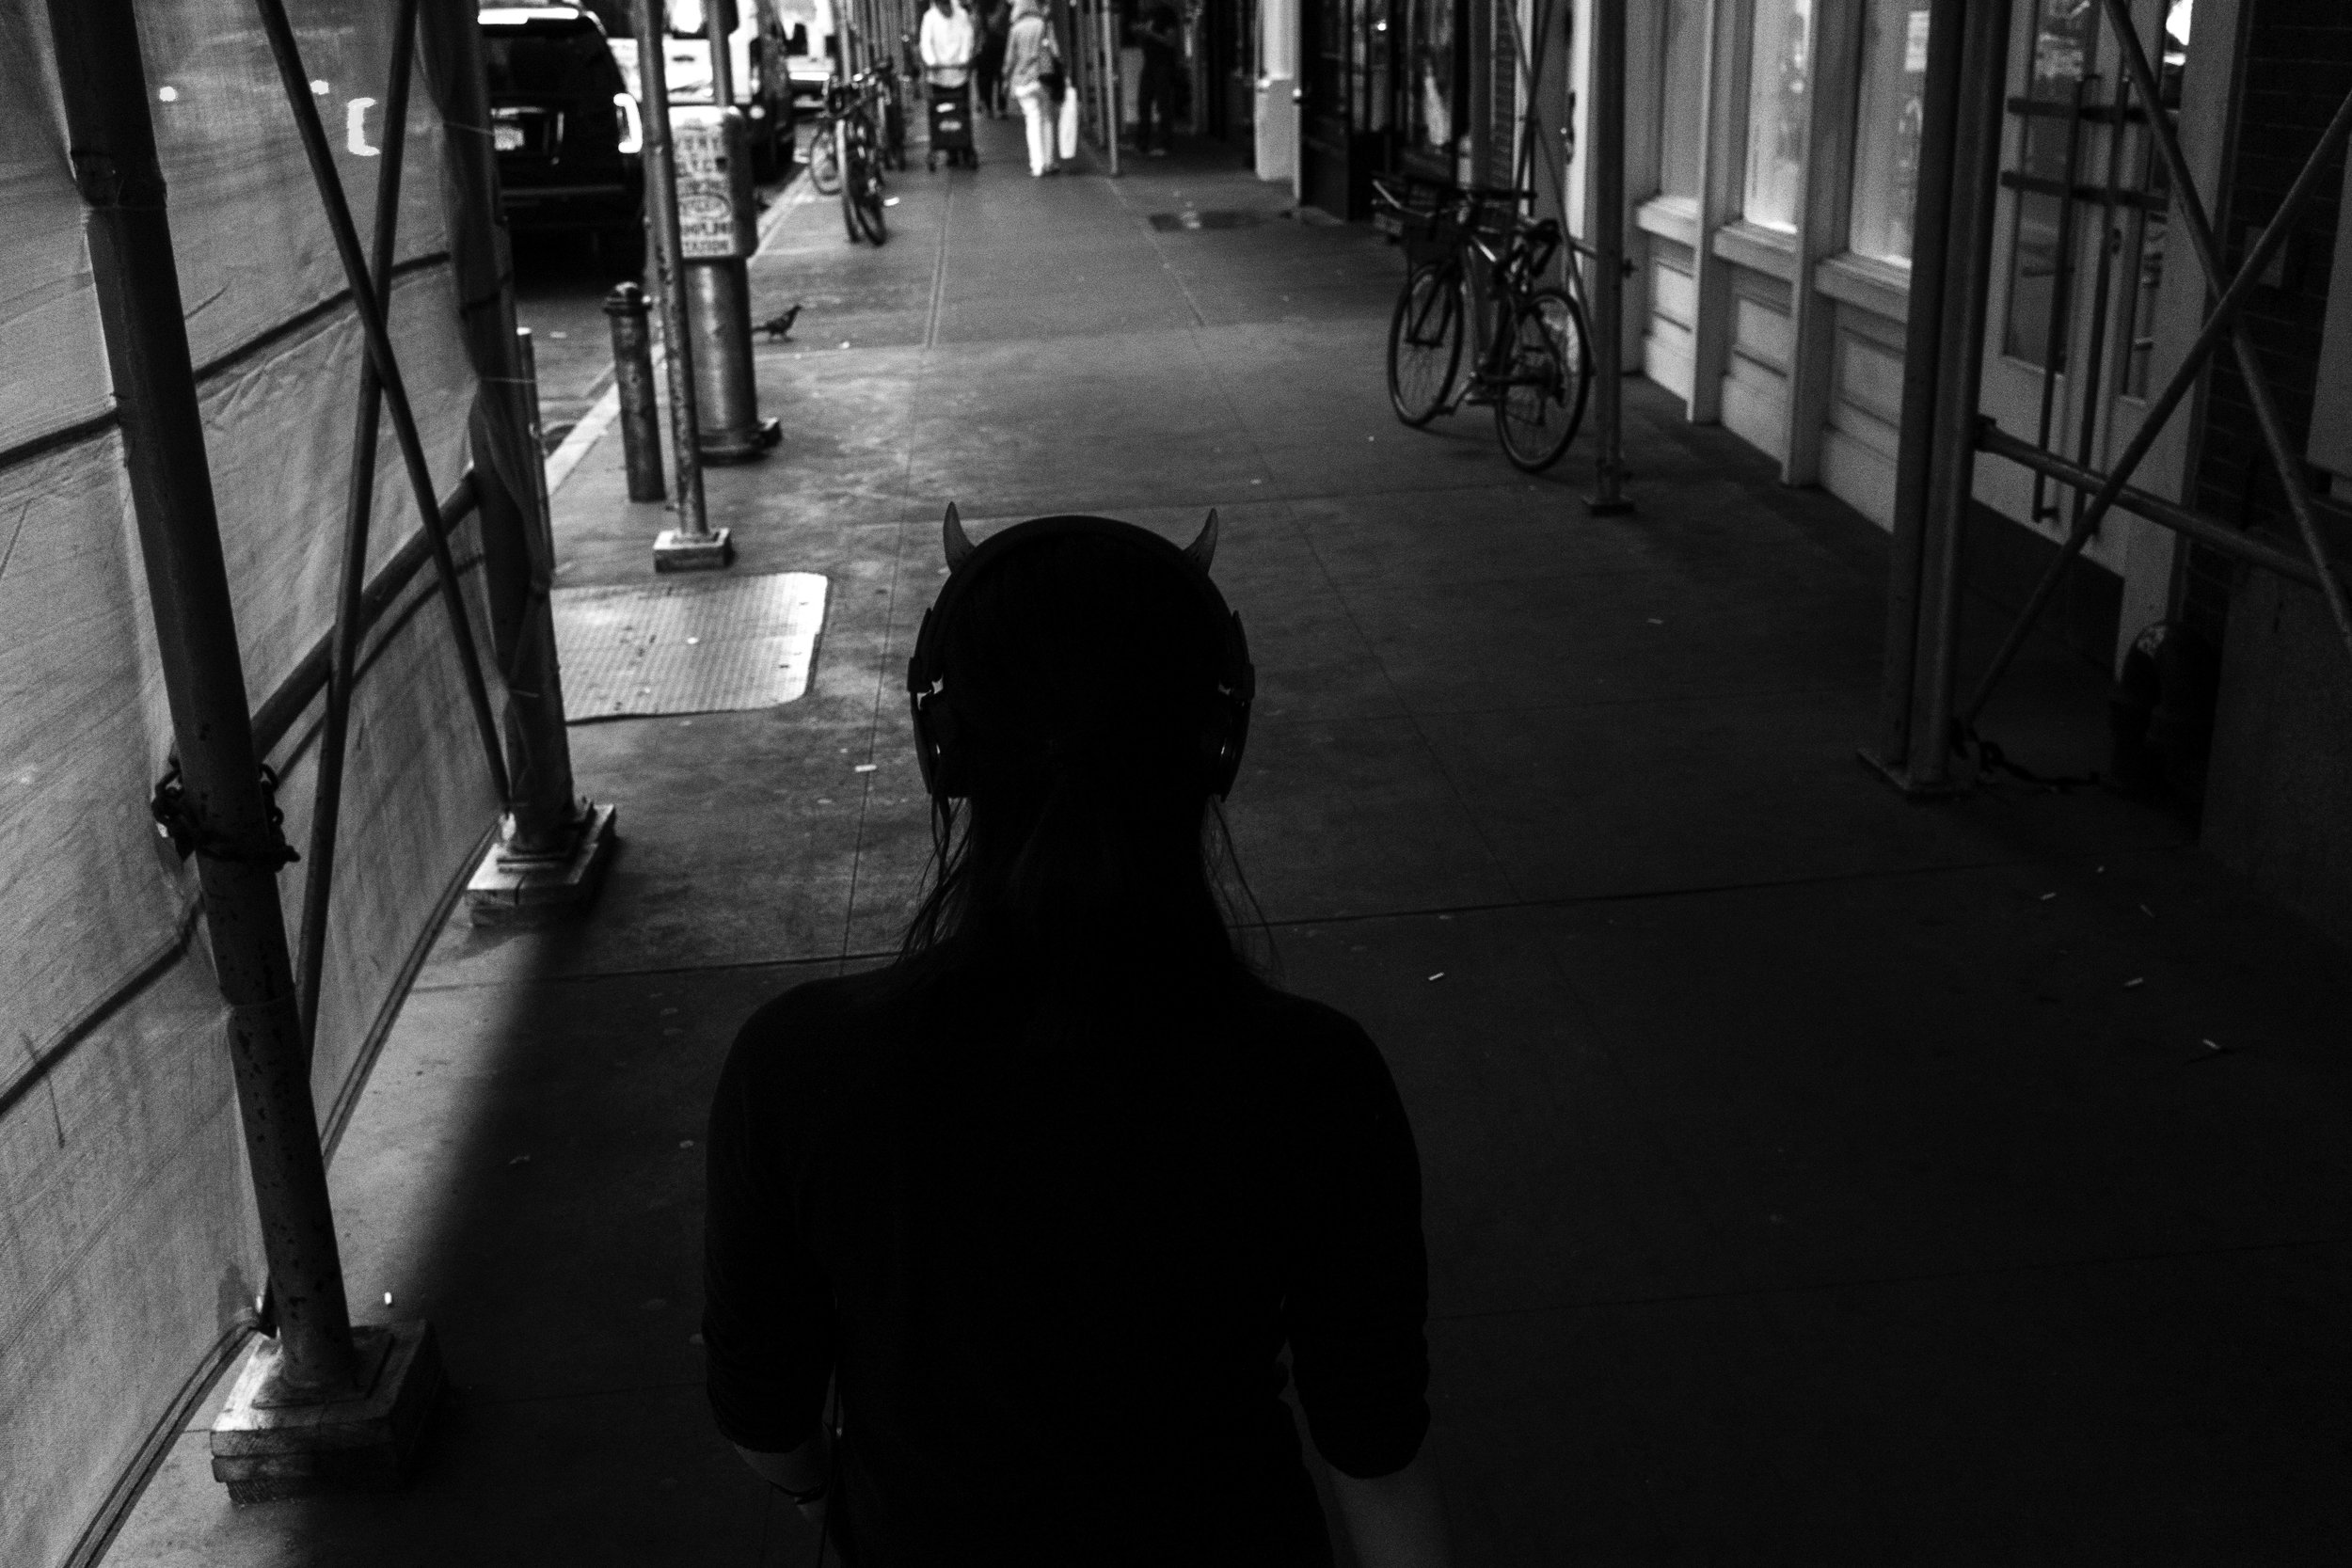 Street_Photo_2016_41.JPG